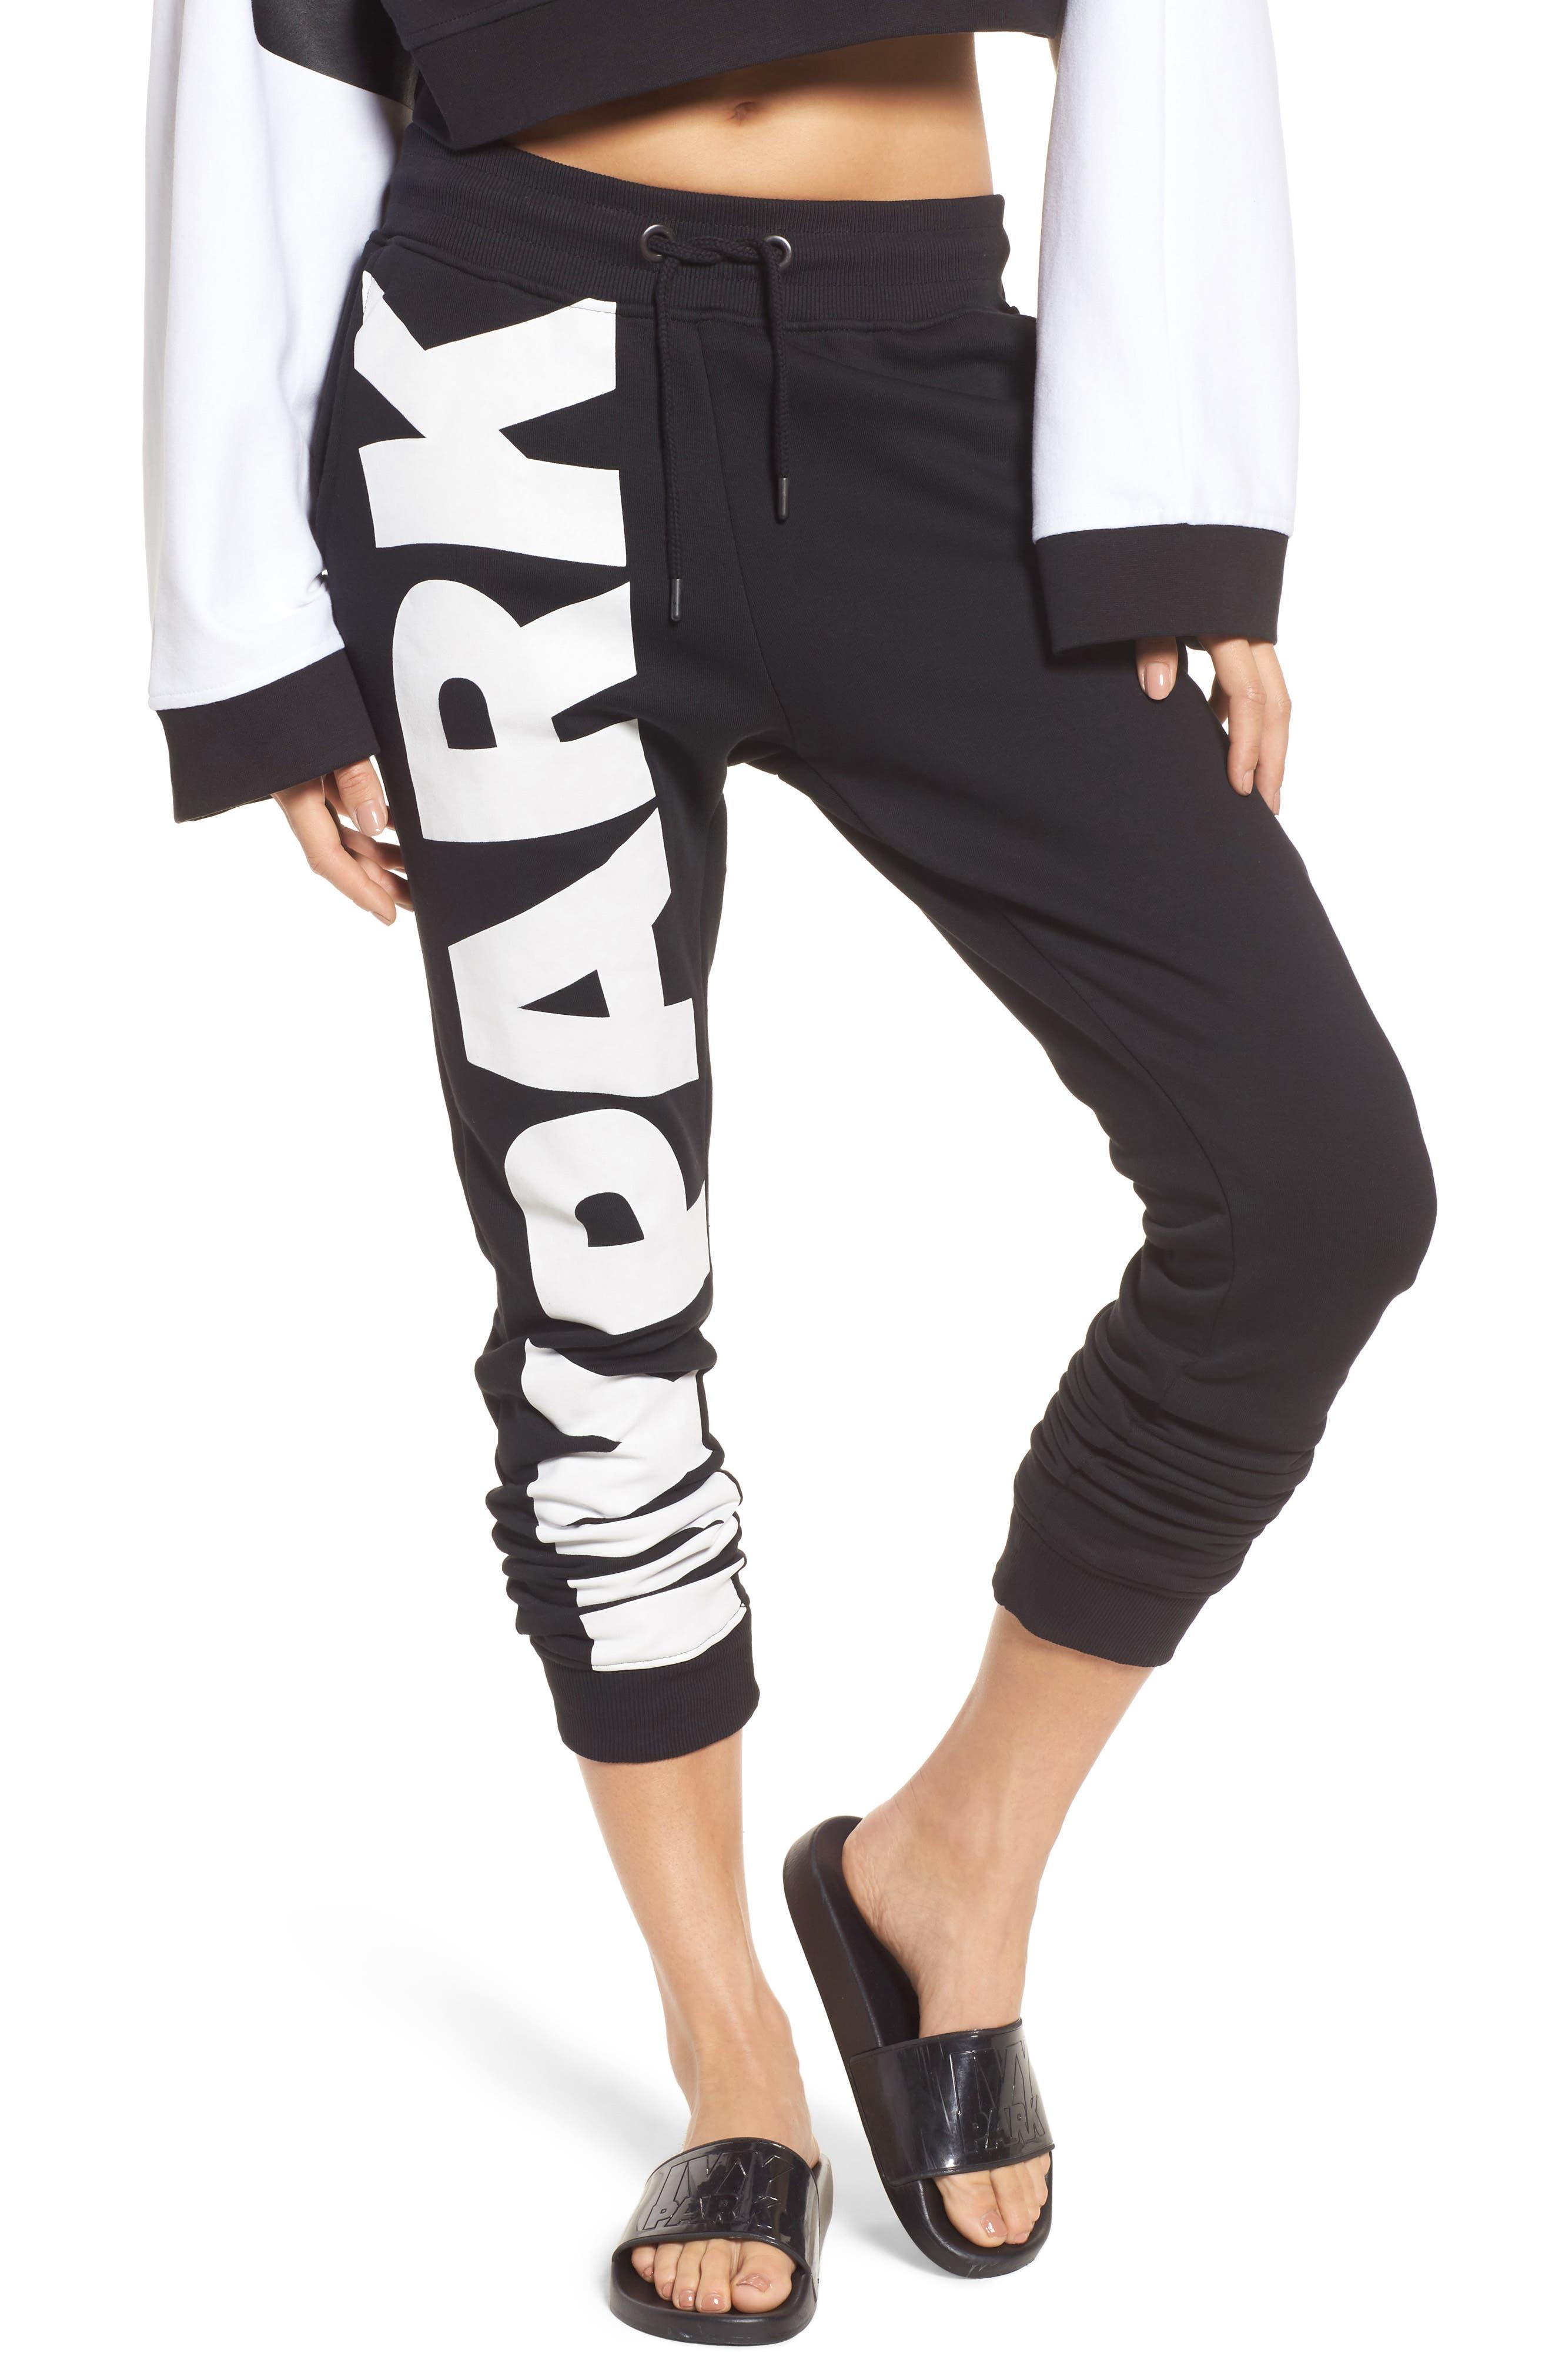 Alternate Image 1 Selected - IVY PARK® Big Logo Jogger Pants